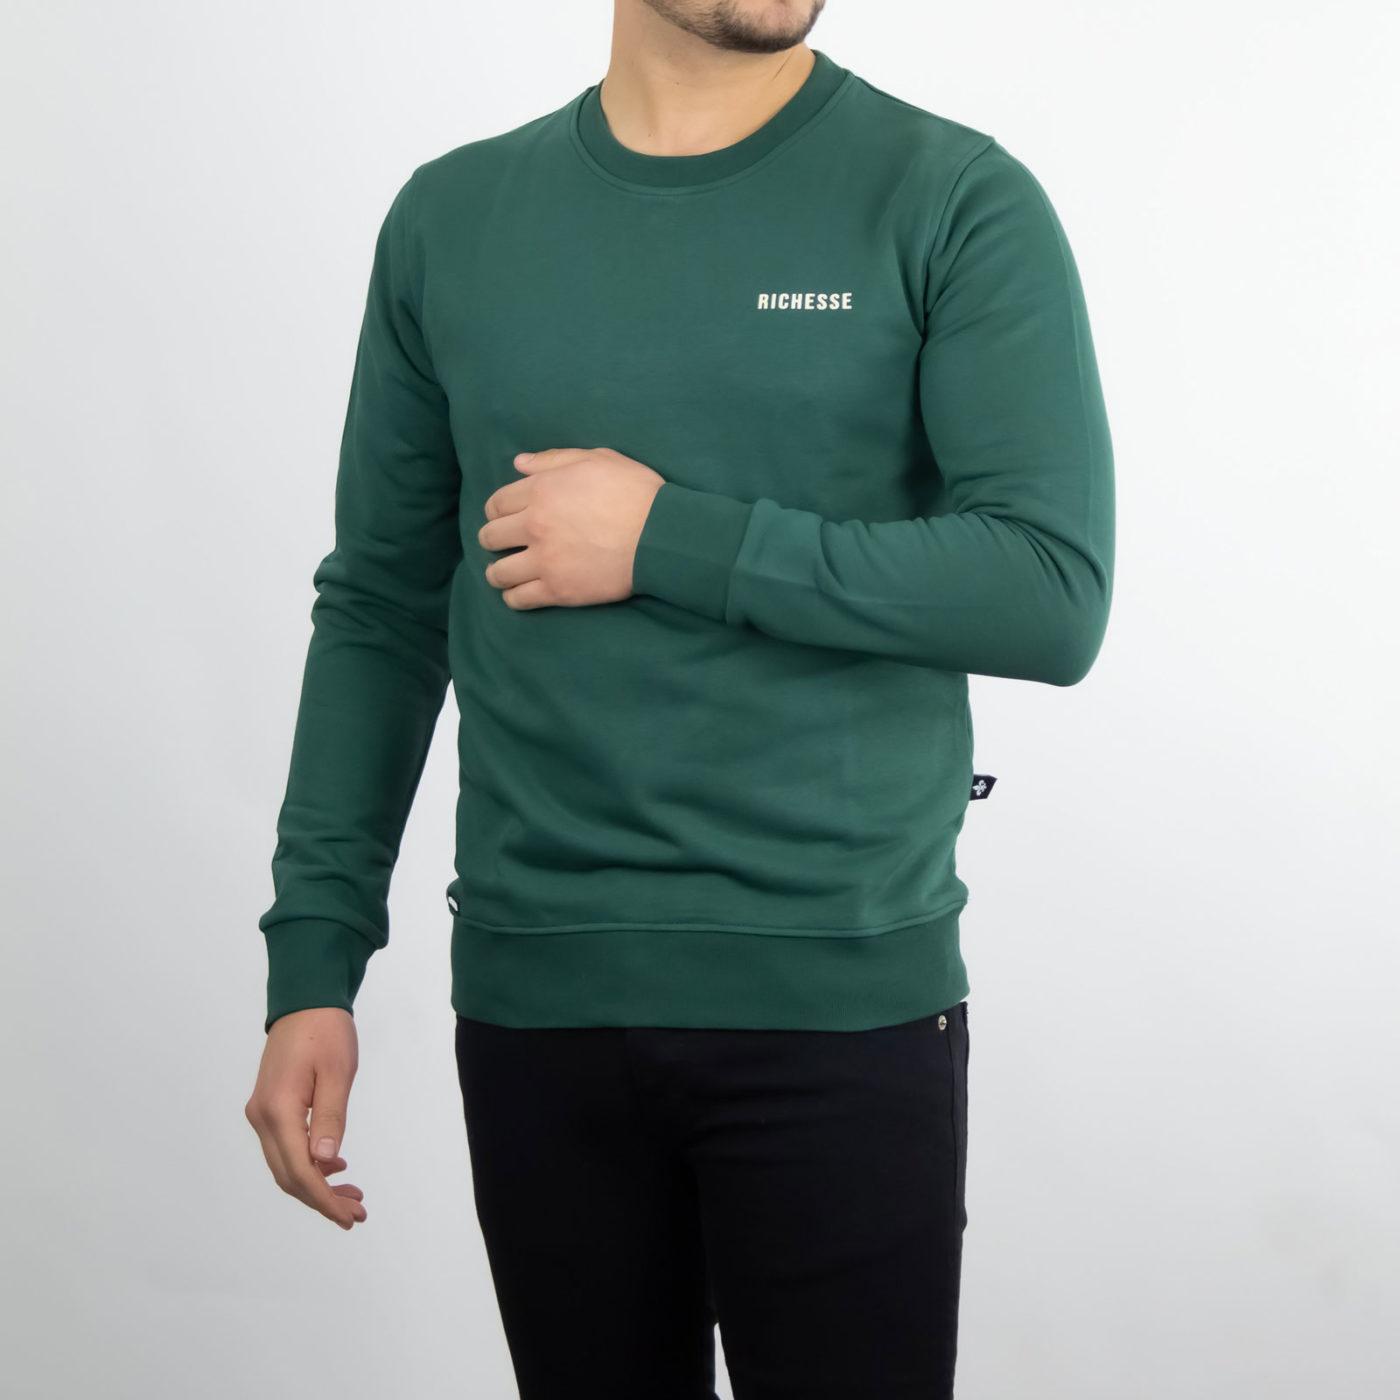 Richesse-Crewneck-Green-1